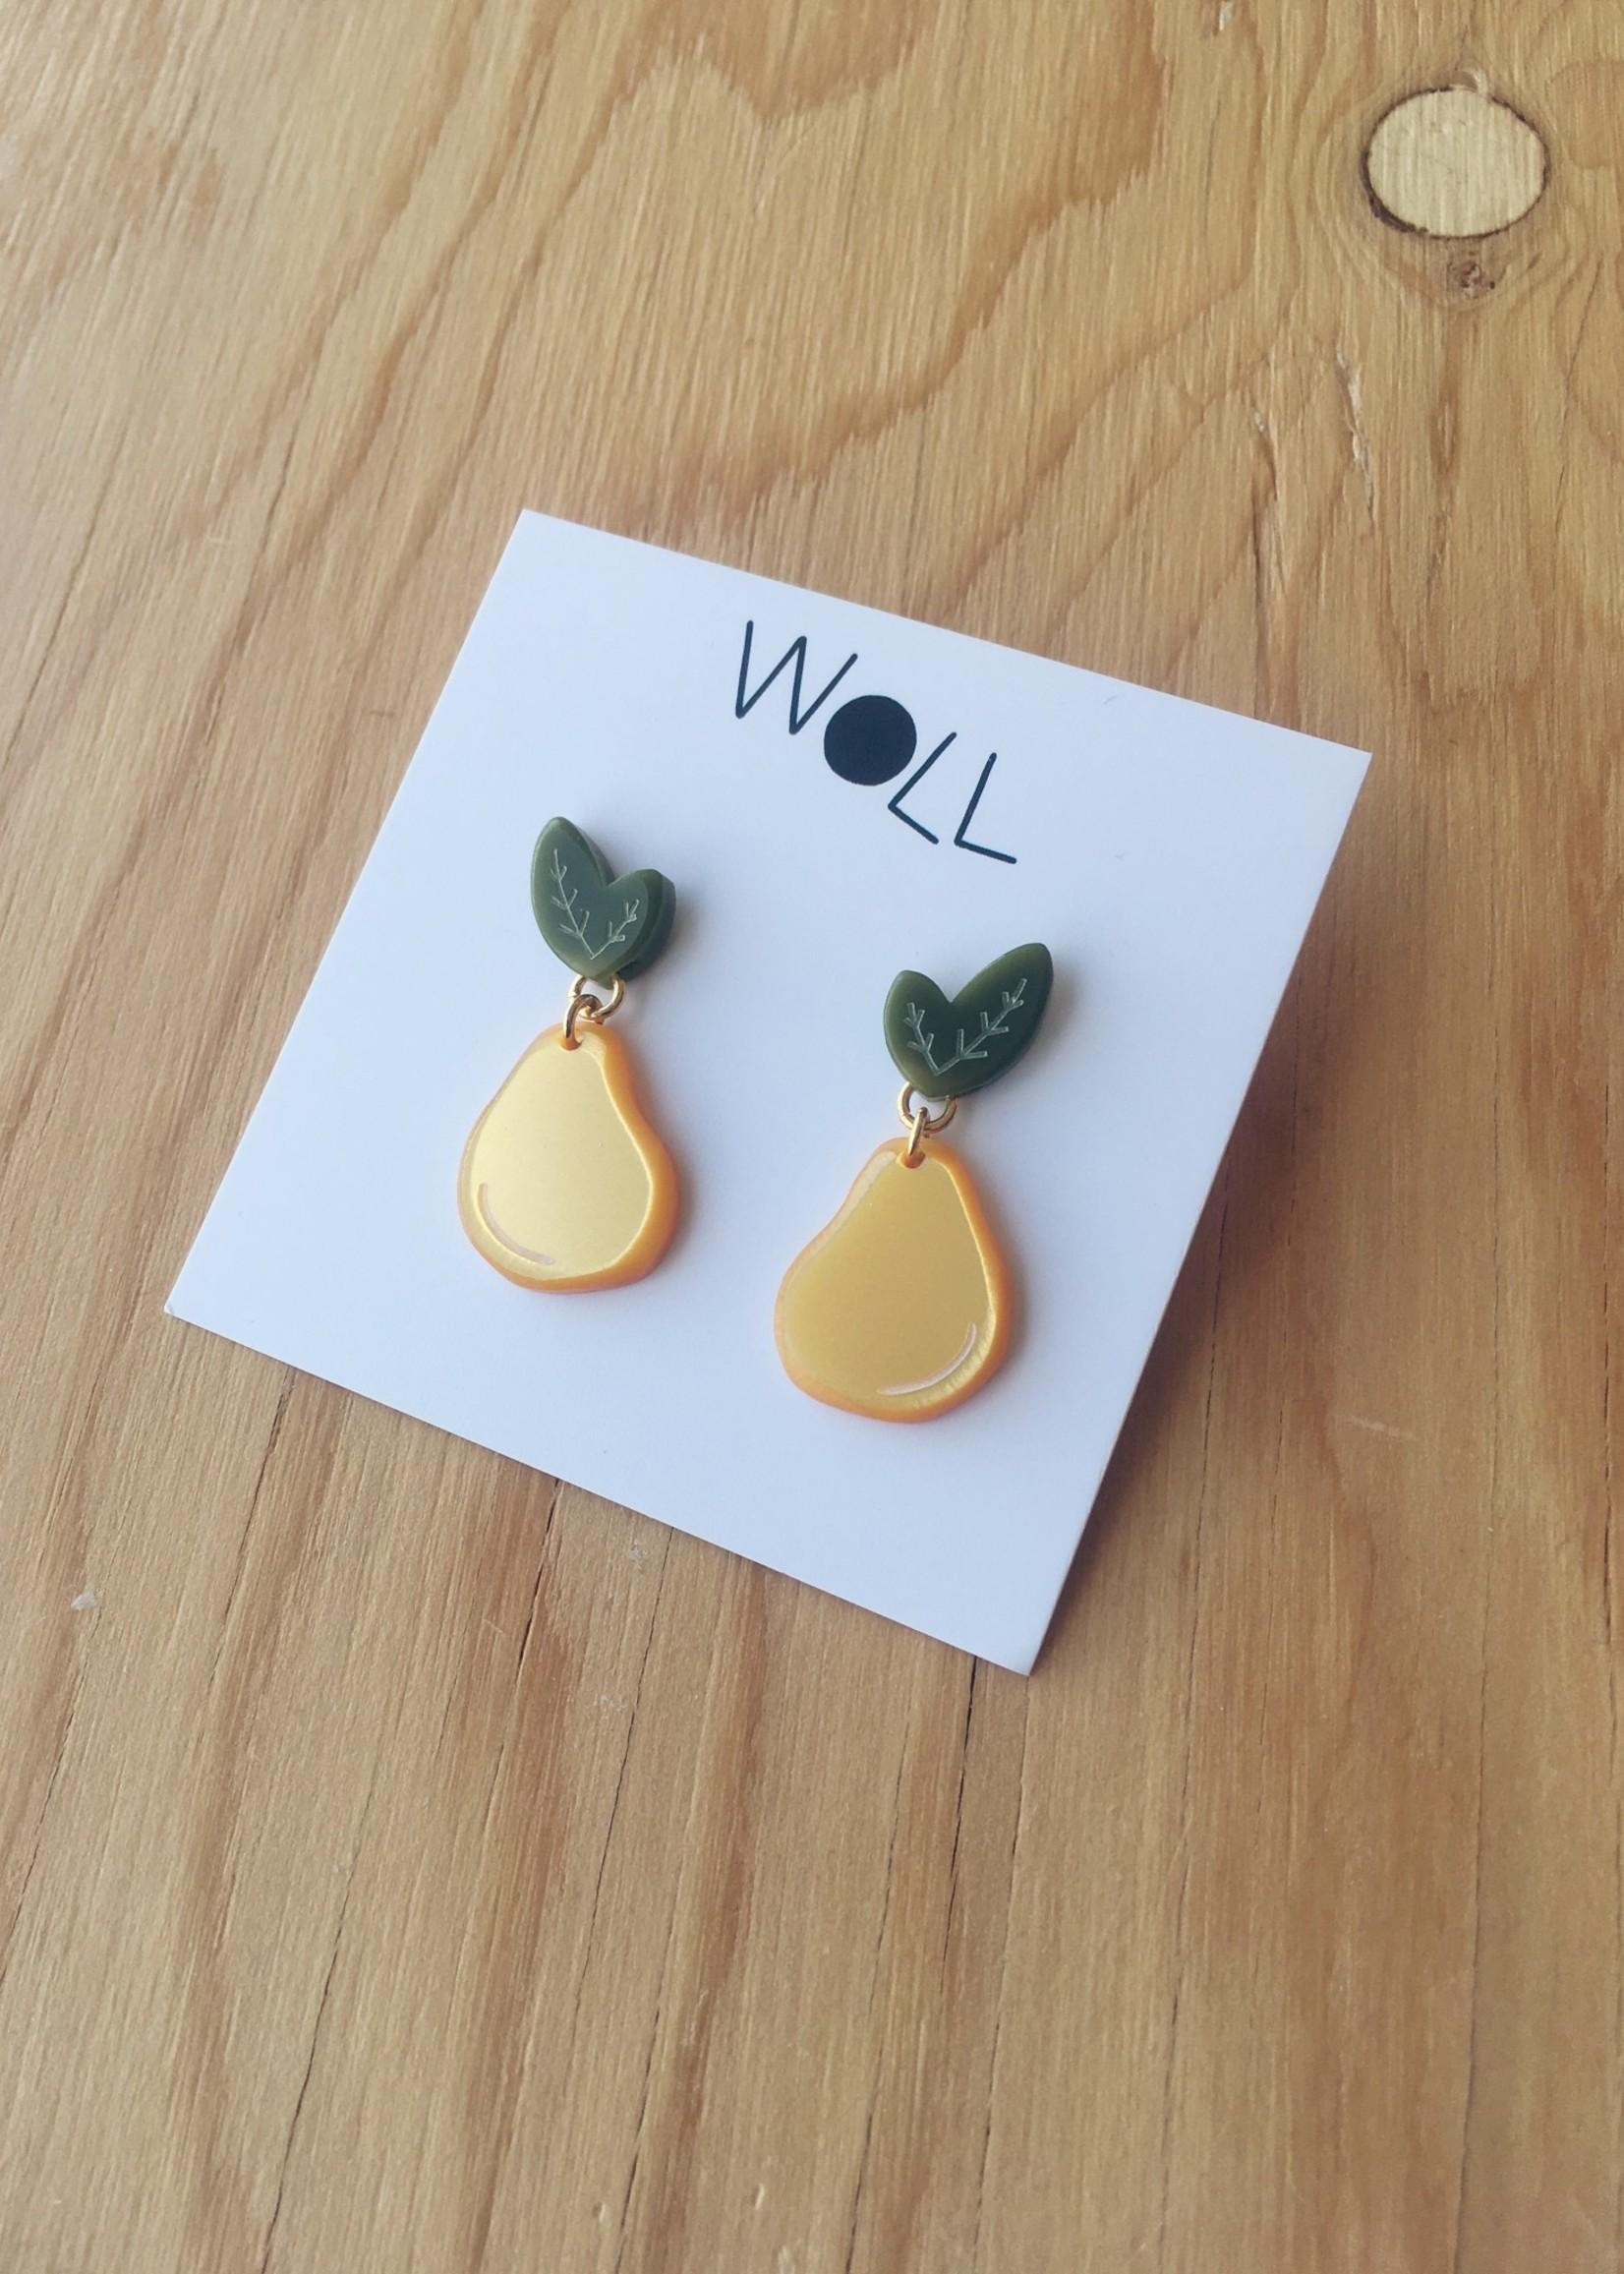 Woll Boucles d'oreilles Fruits